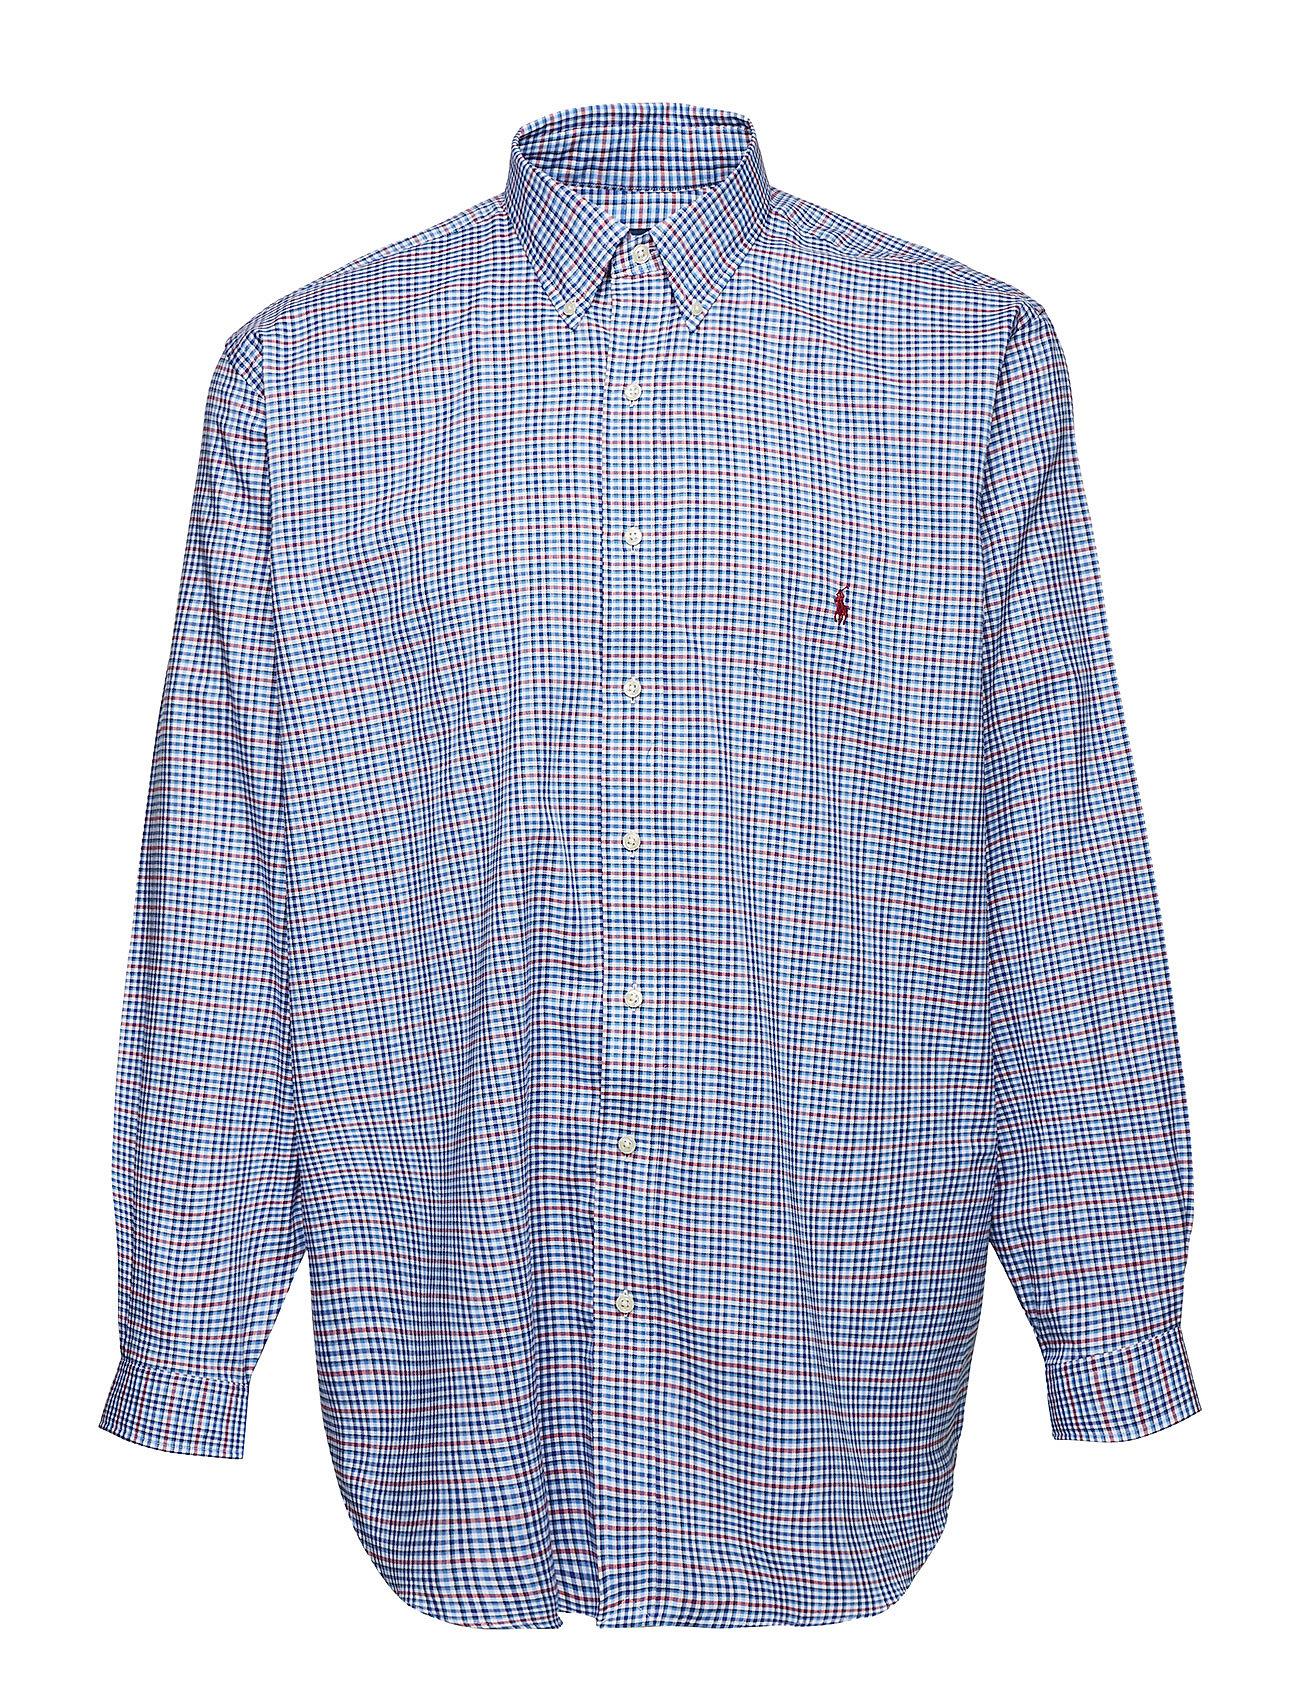 6ffe970595ed Classic Fit Plaid Twill Shirt (2915 Cadet Blue/w) (£59.95) - Polo ...